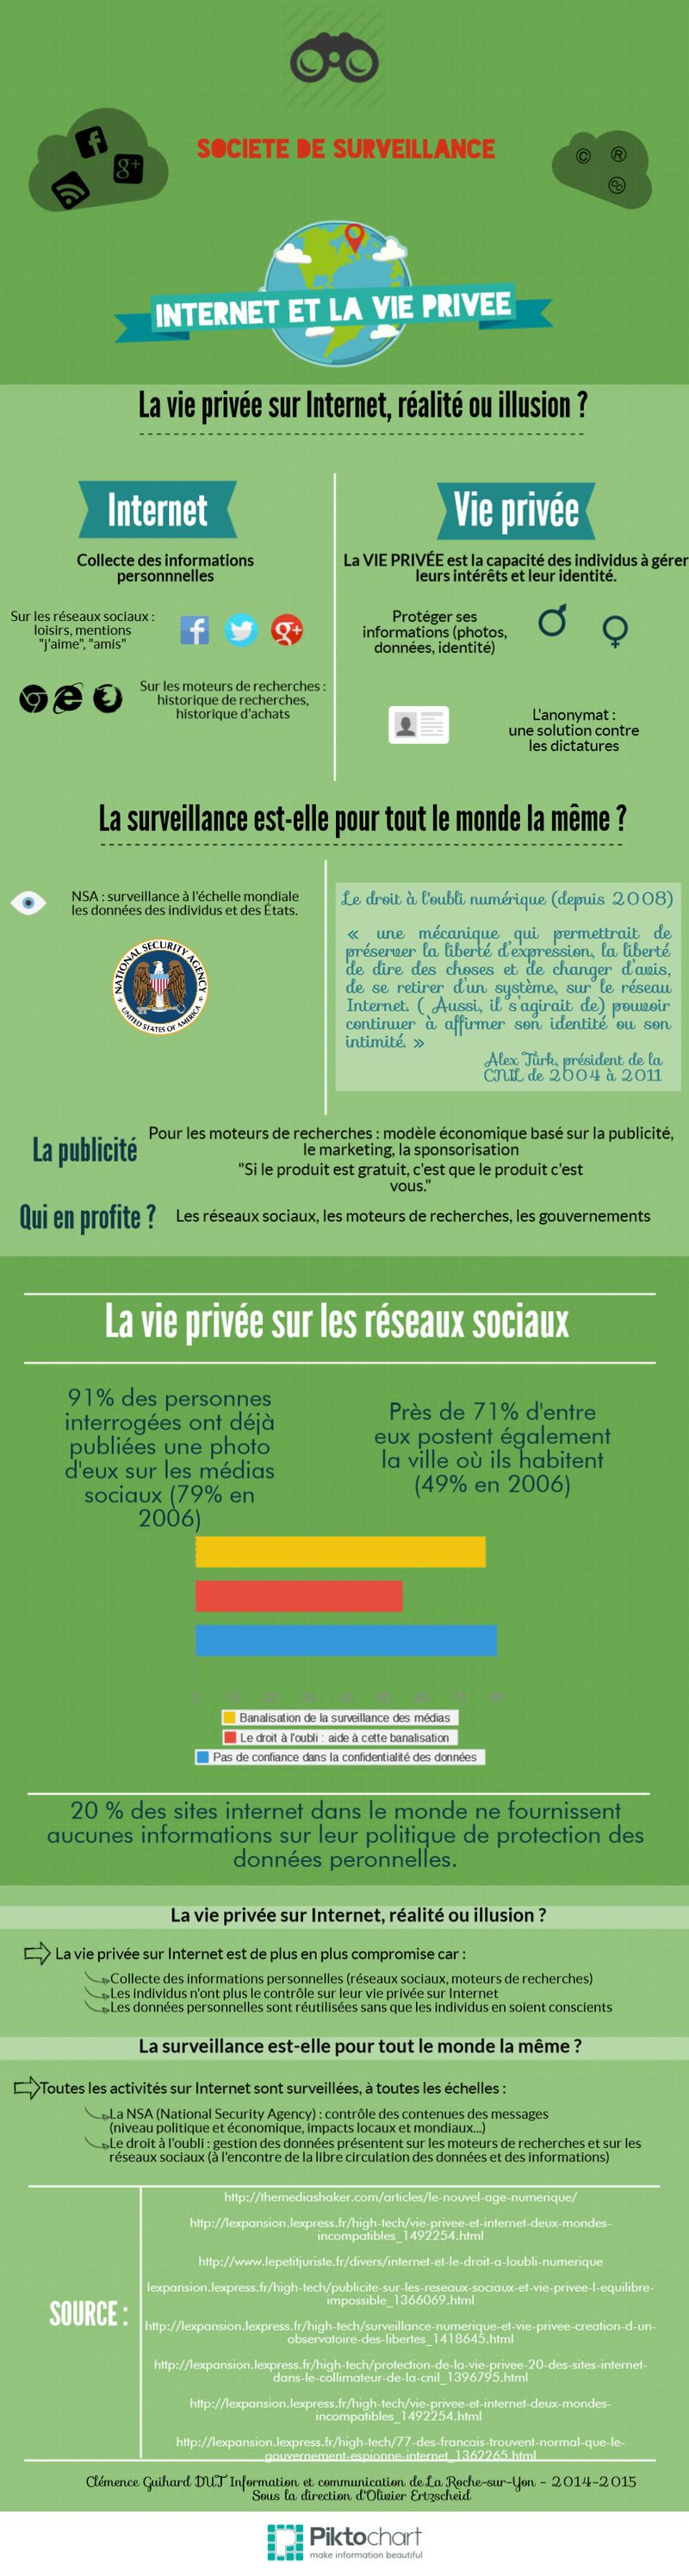 GuihardClemence_CultureNumerique_Infographie_InternetViePrivee_Societ eDeSurveillance